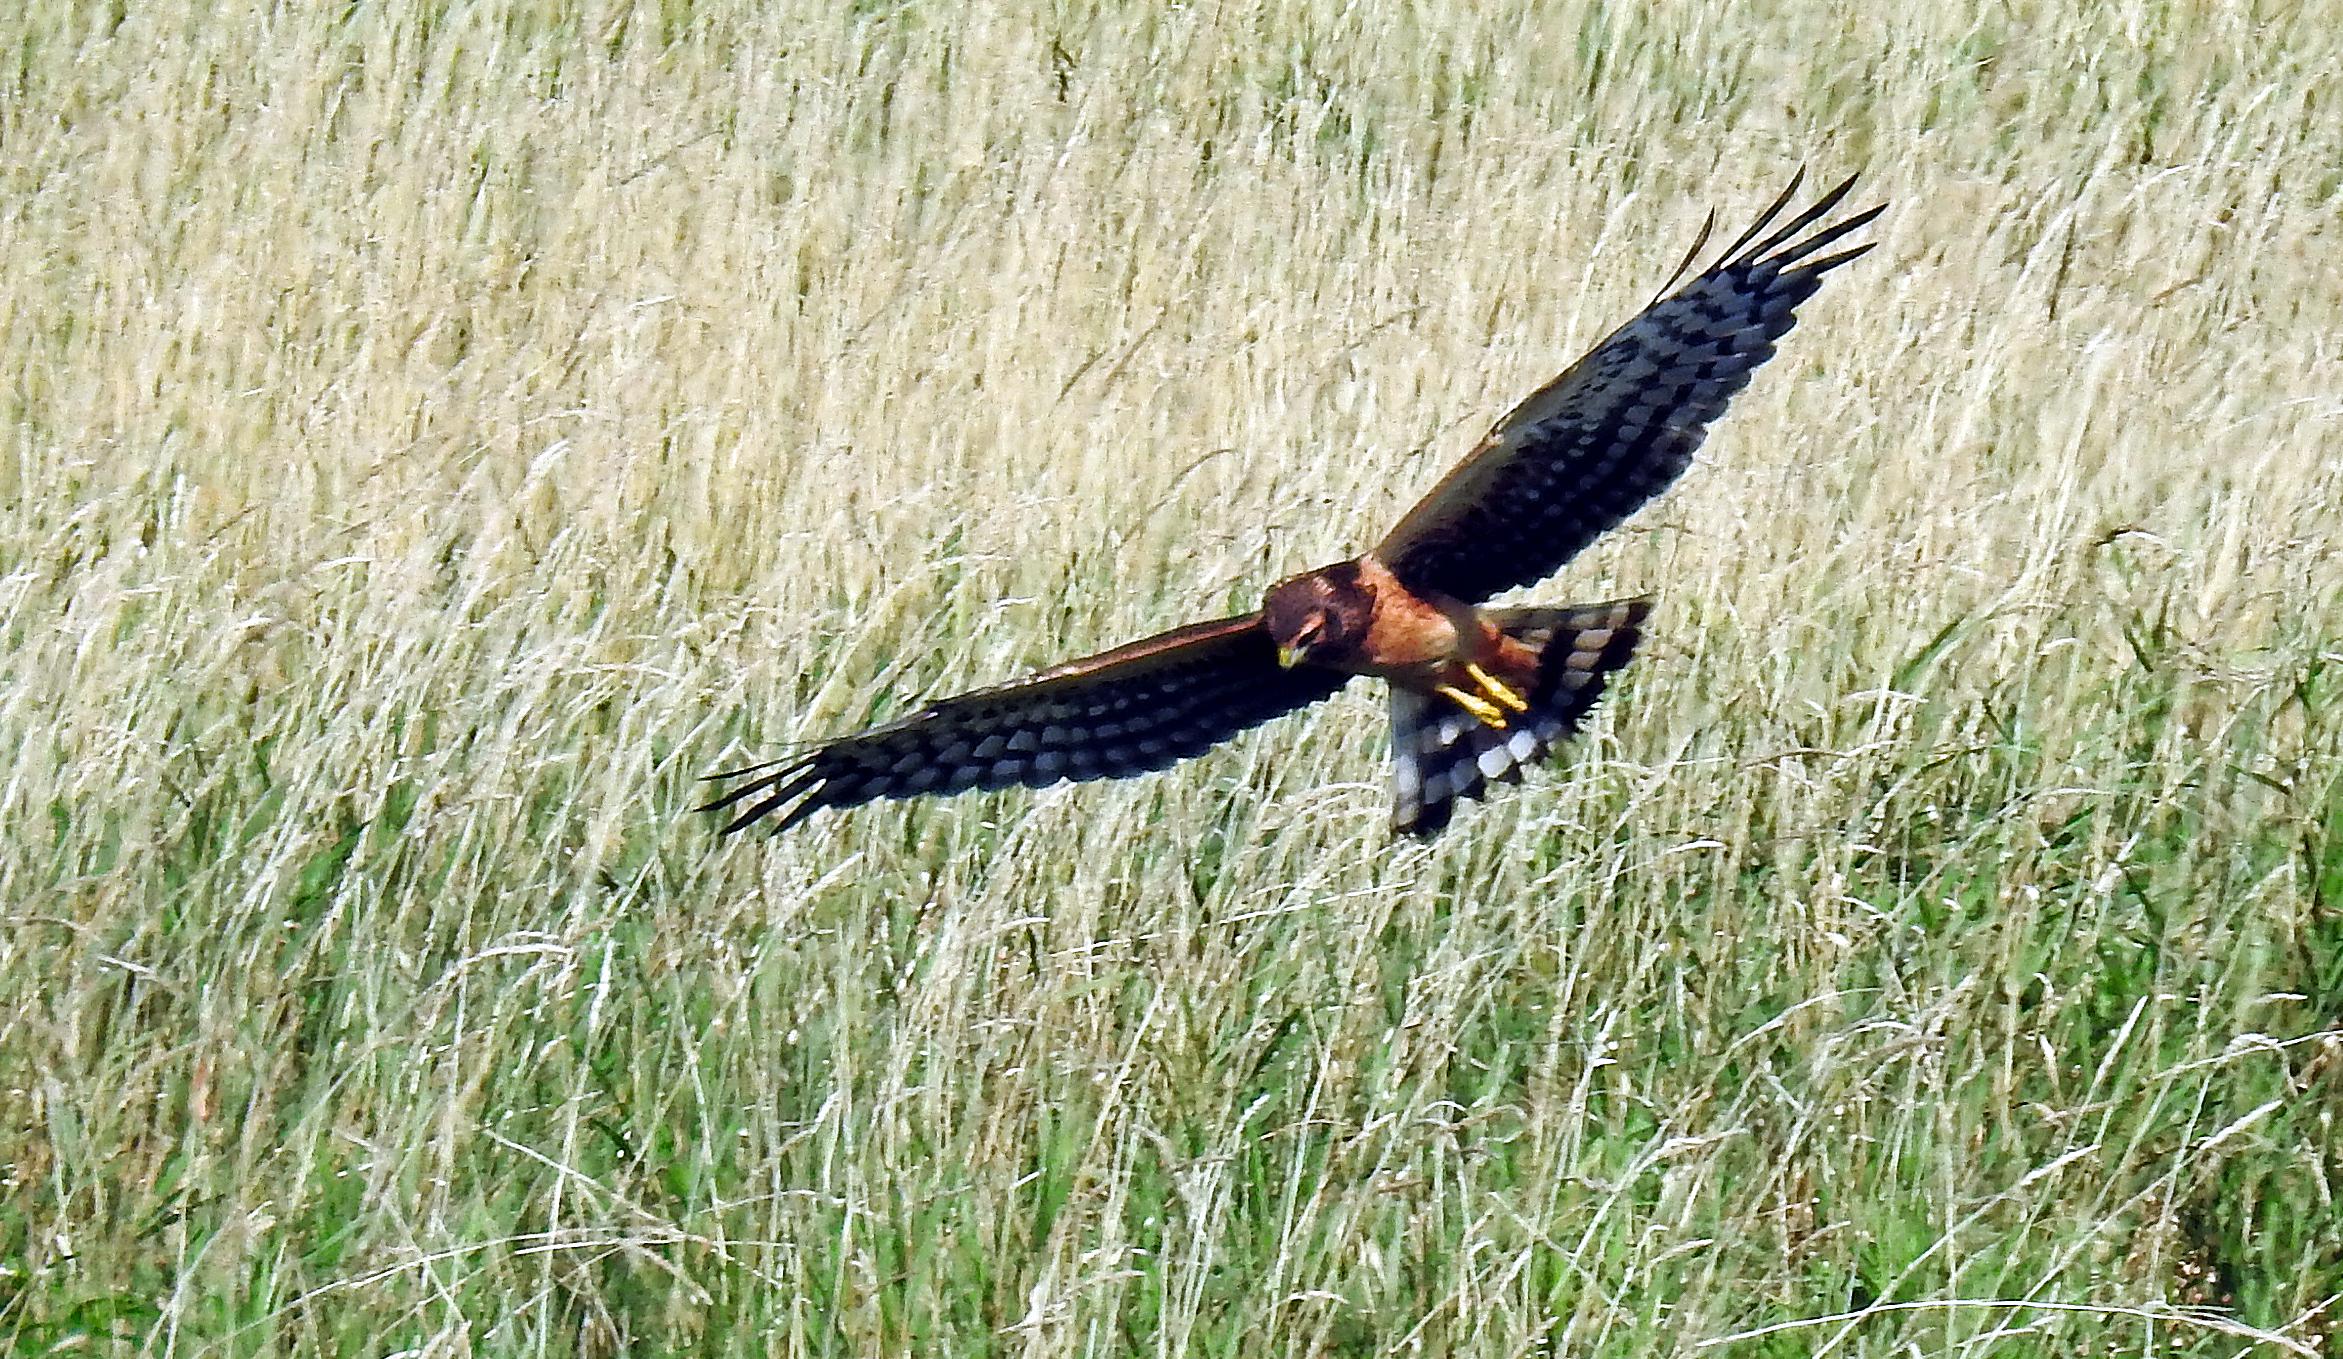 Northern Harrier Photo: Bill Boccio